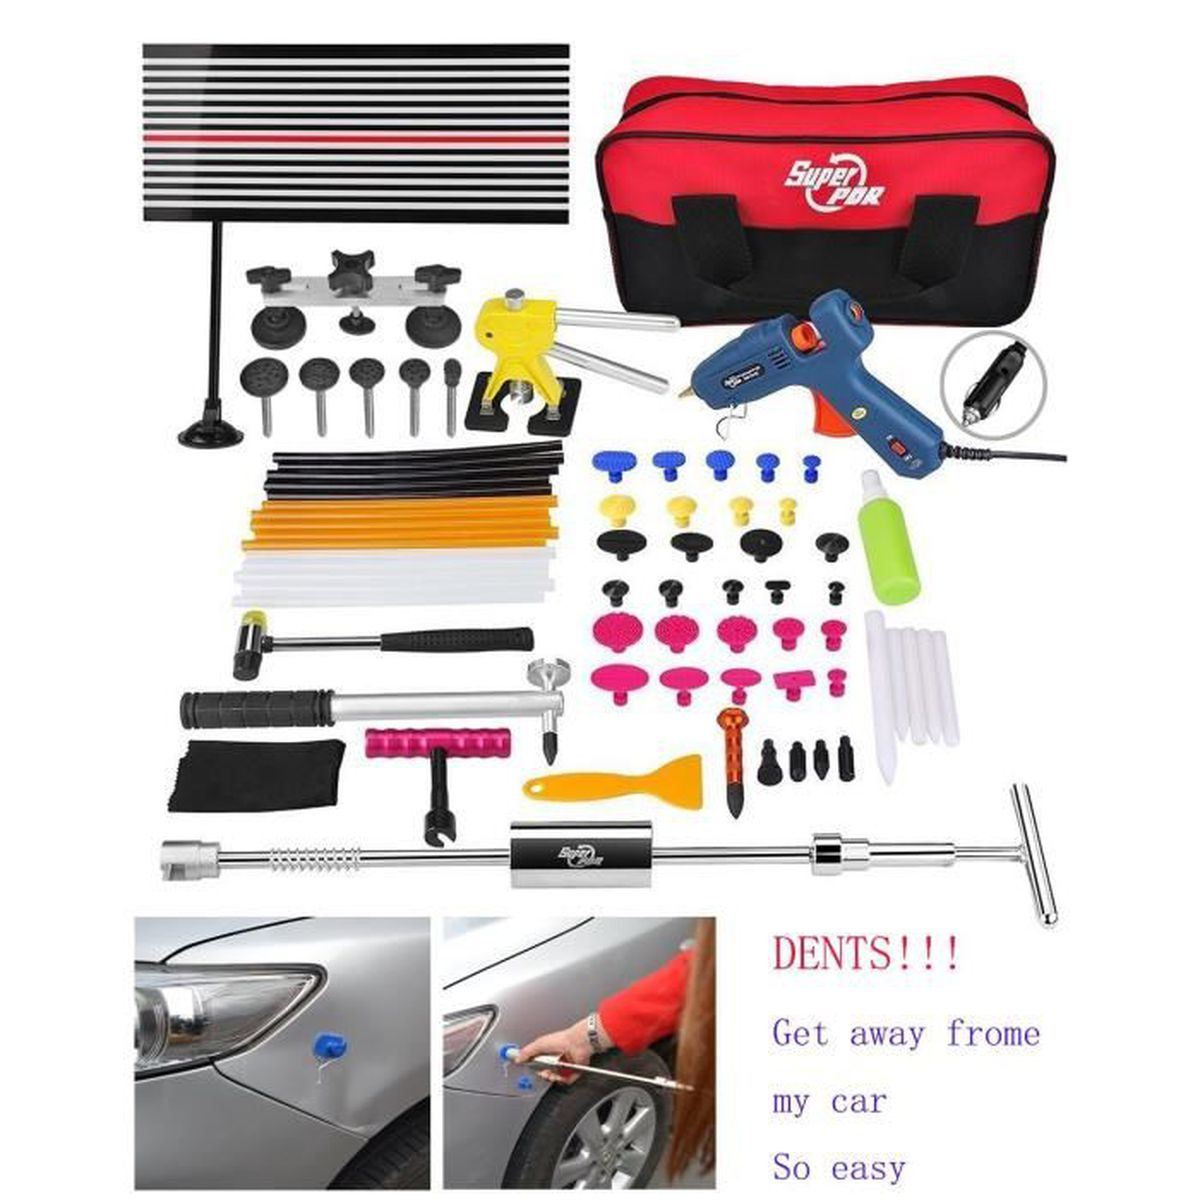 super pdr 65 pi ces auto outils de r paration carrosserie outillage kit achat vente v rin. Black Bedroom Furniture Sets. Home Design Ideas